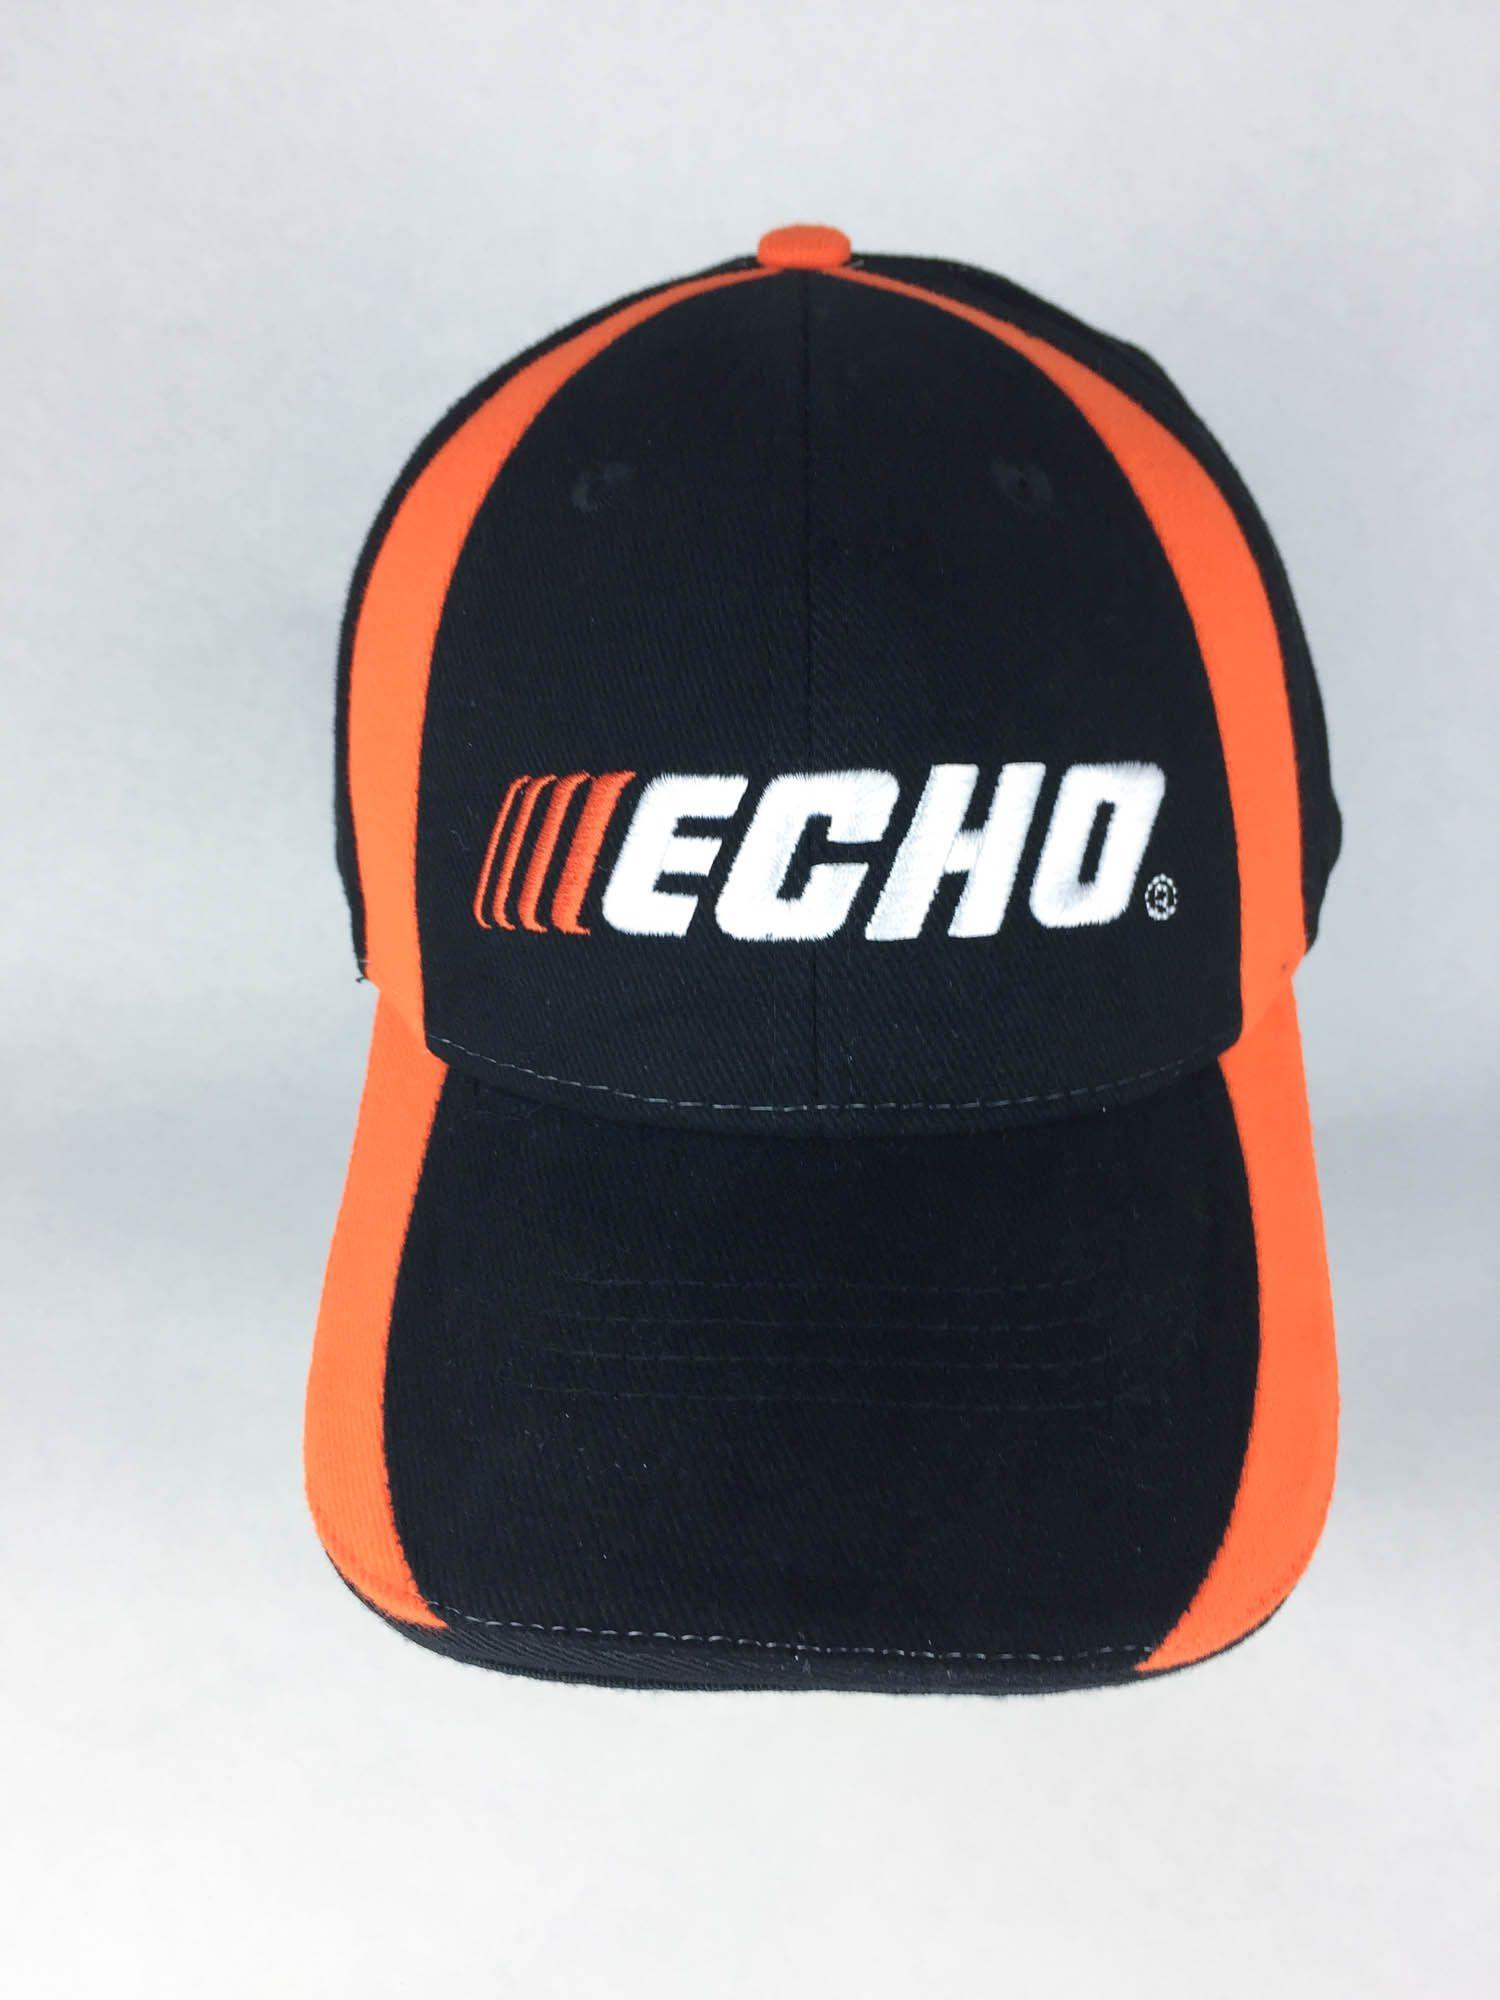 ECHO Chainsaw Baseball Hat Baseball hats, Hats, Baseball